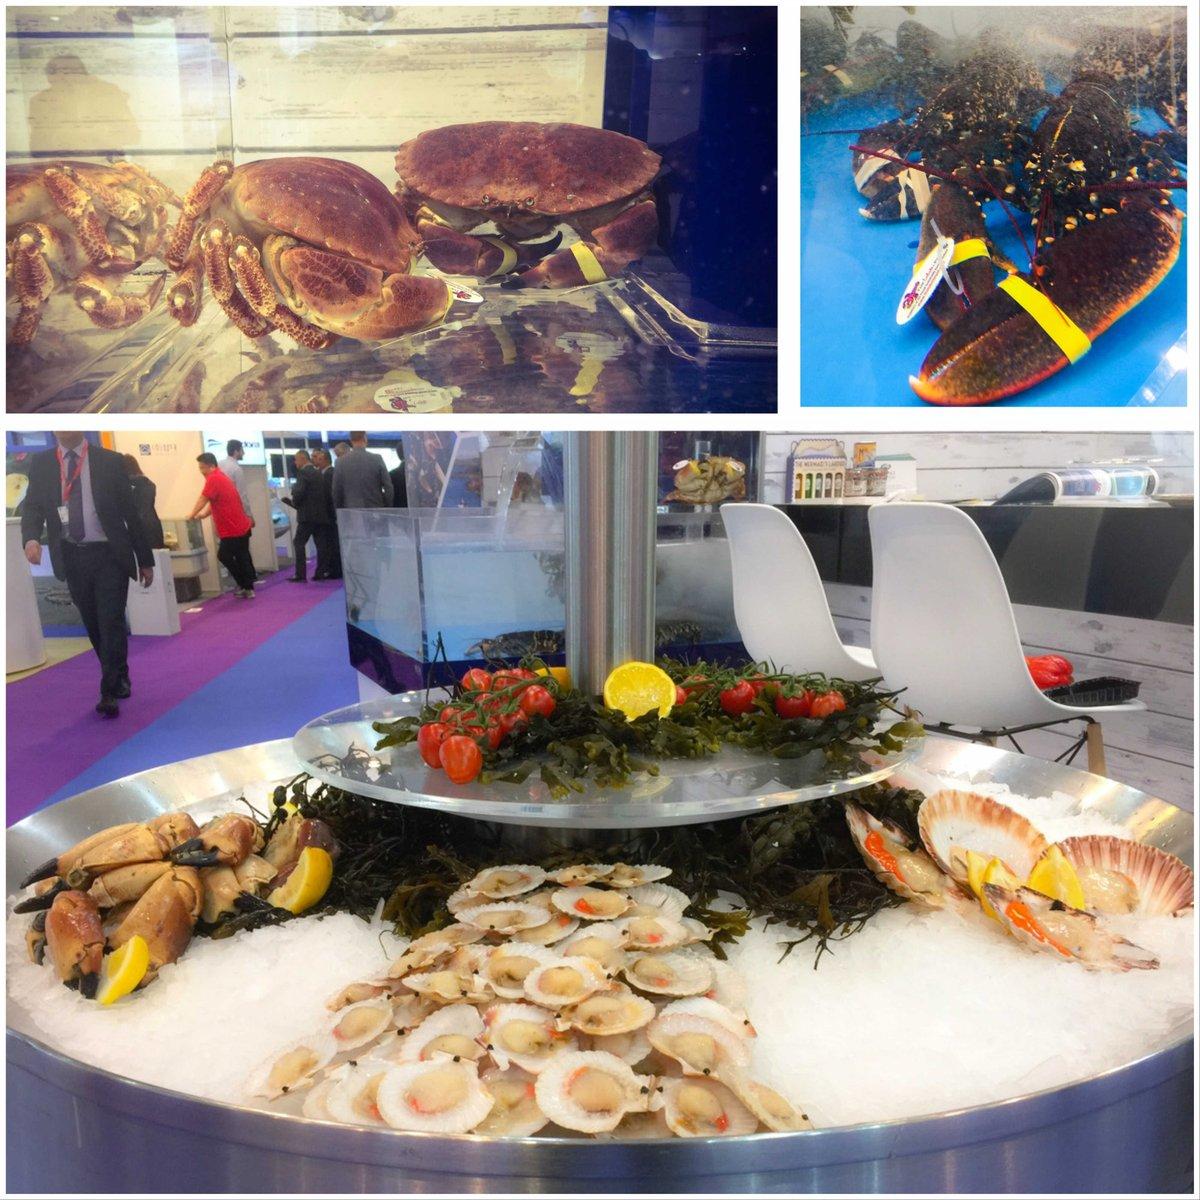 Welsh produce looking fantastic! #seafood #crab #lobster #scallops #SEG17